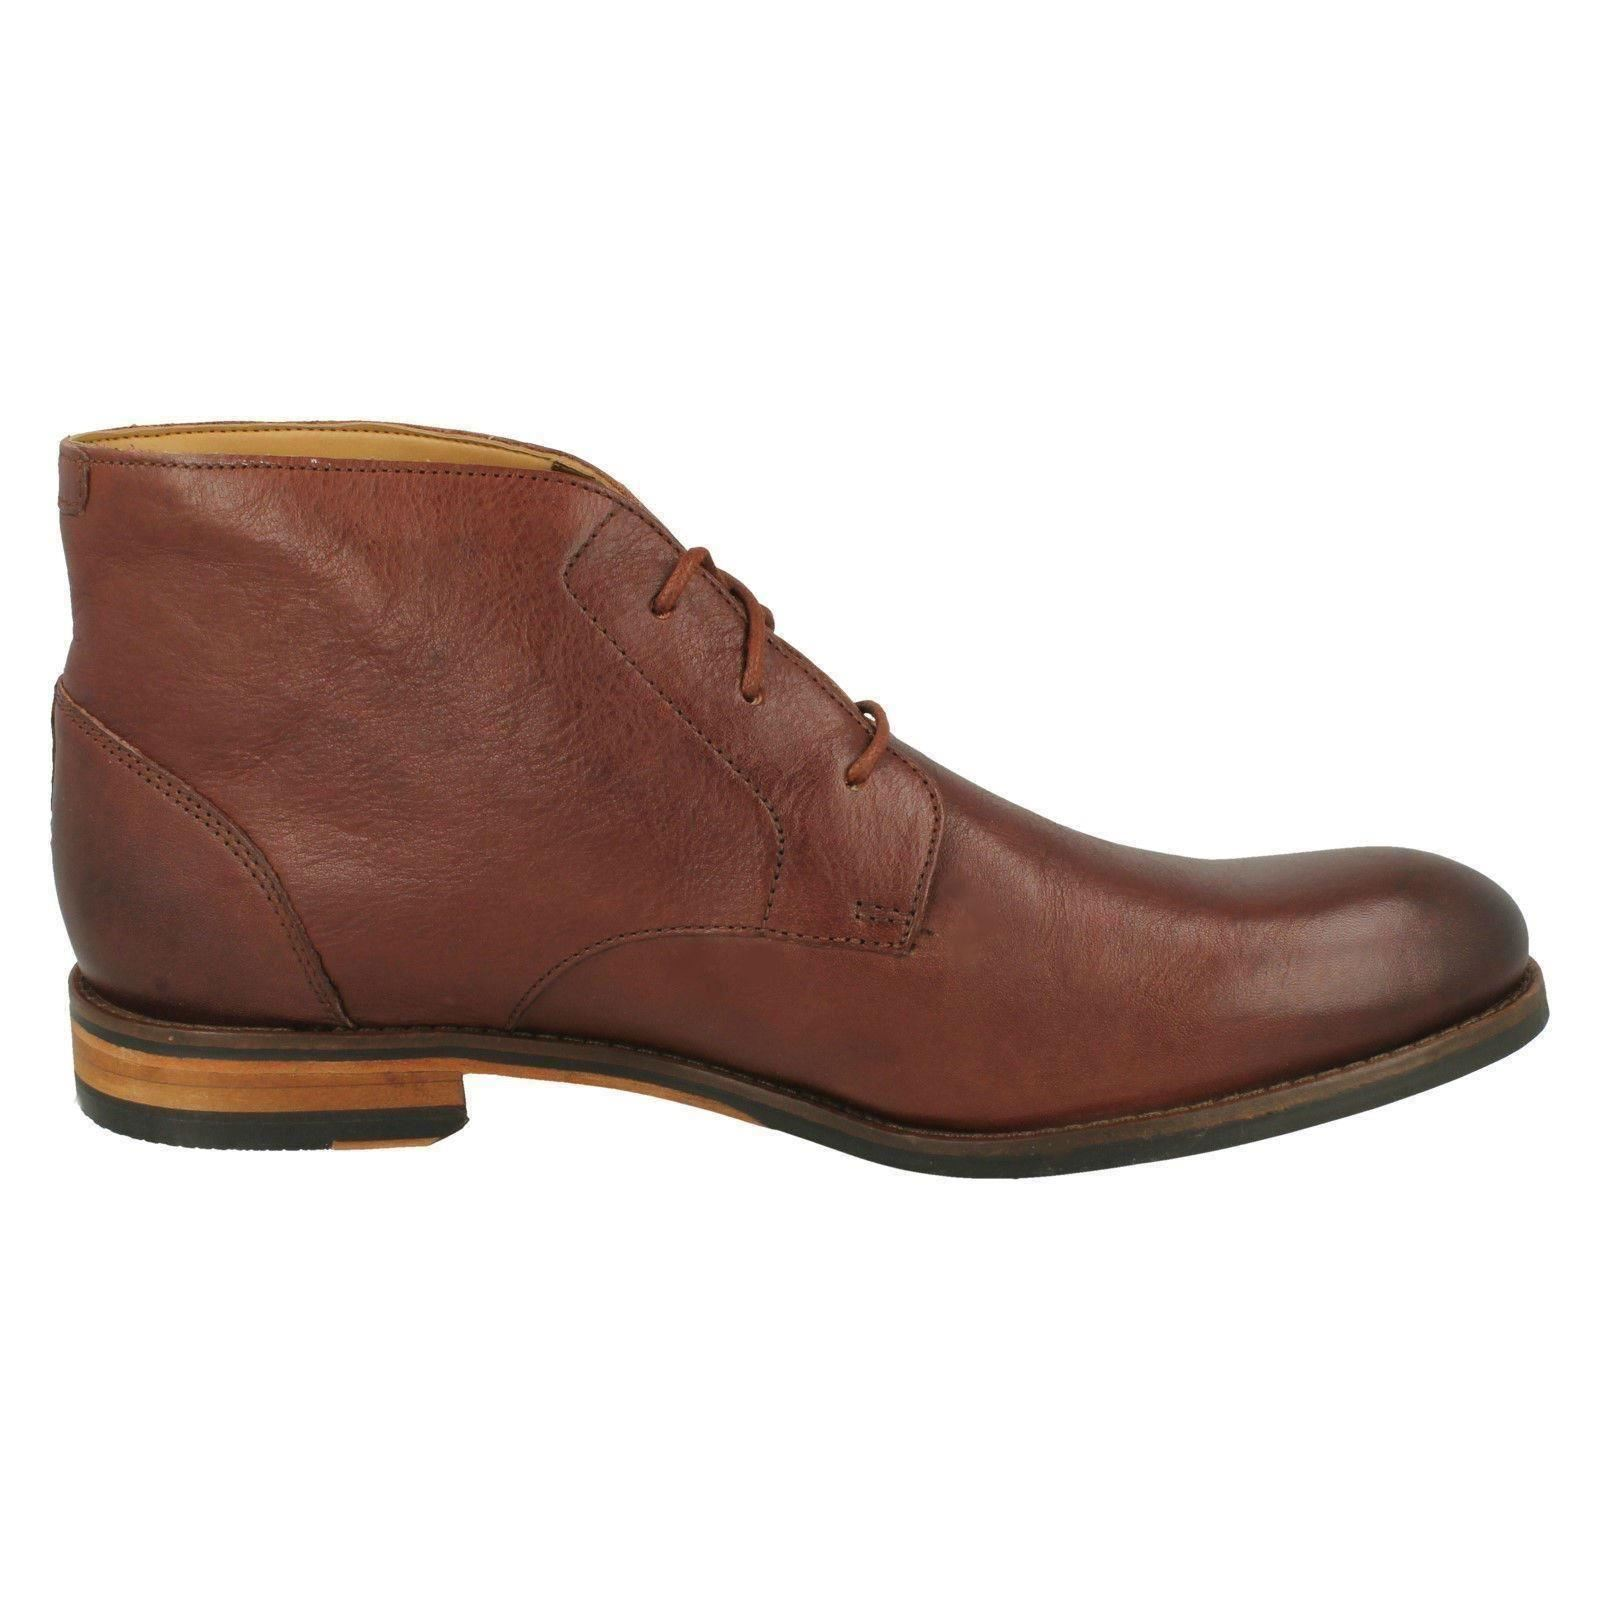 cordones Botas Flow hombre British Top marrón con para Clarks Tan rTwqrxp